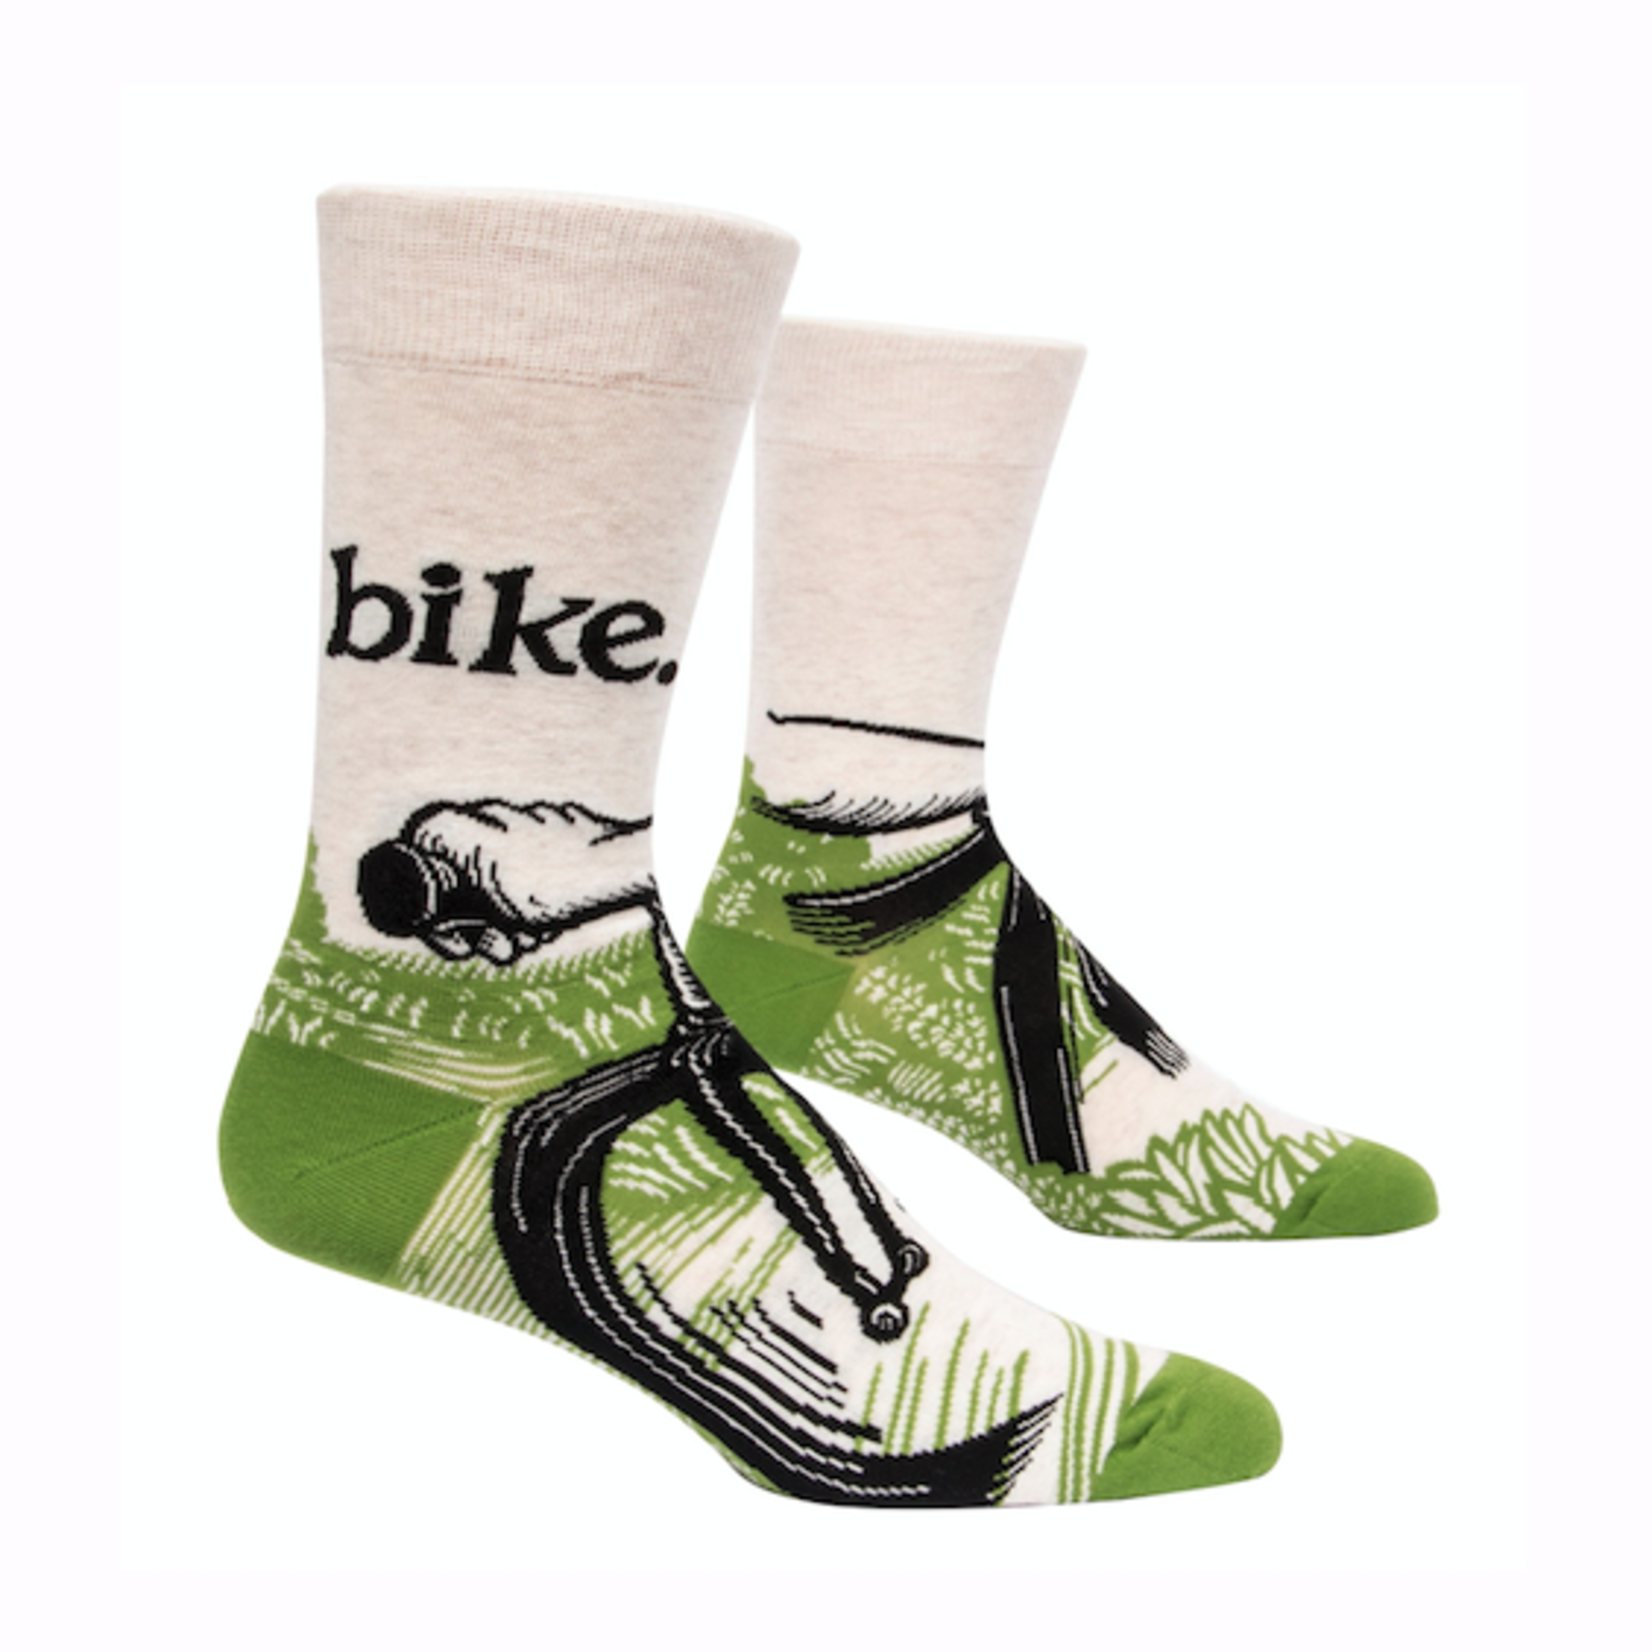 Bike Path Men's Crew Socks